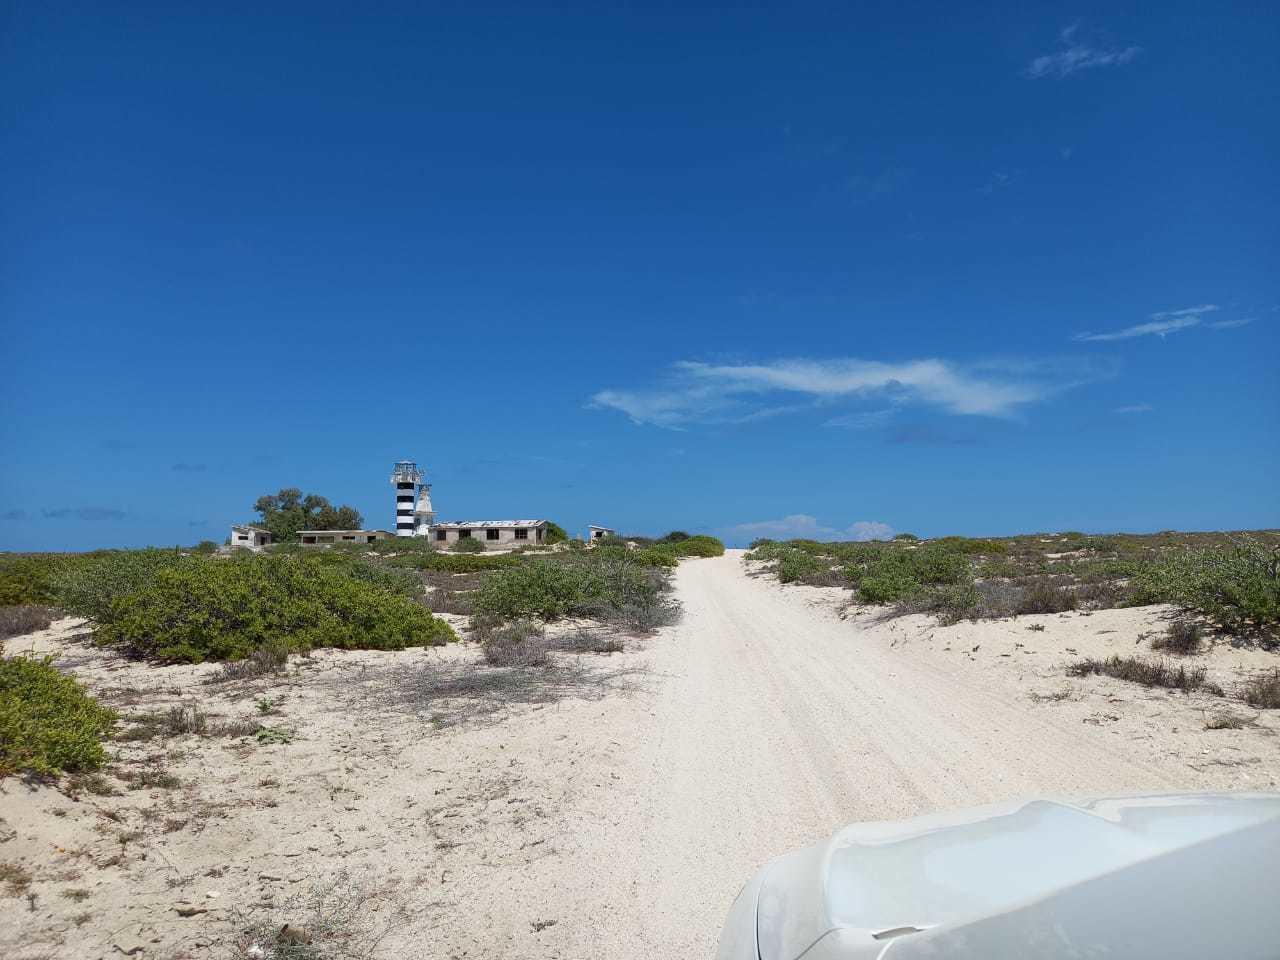 Playa El Faro, East Cape